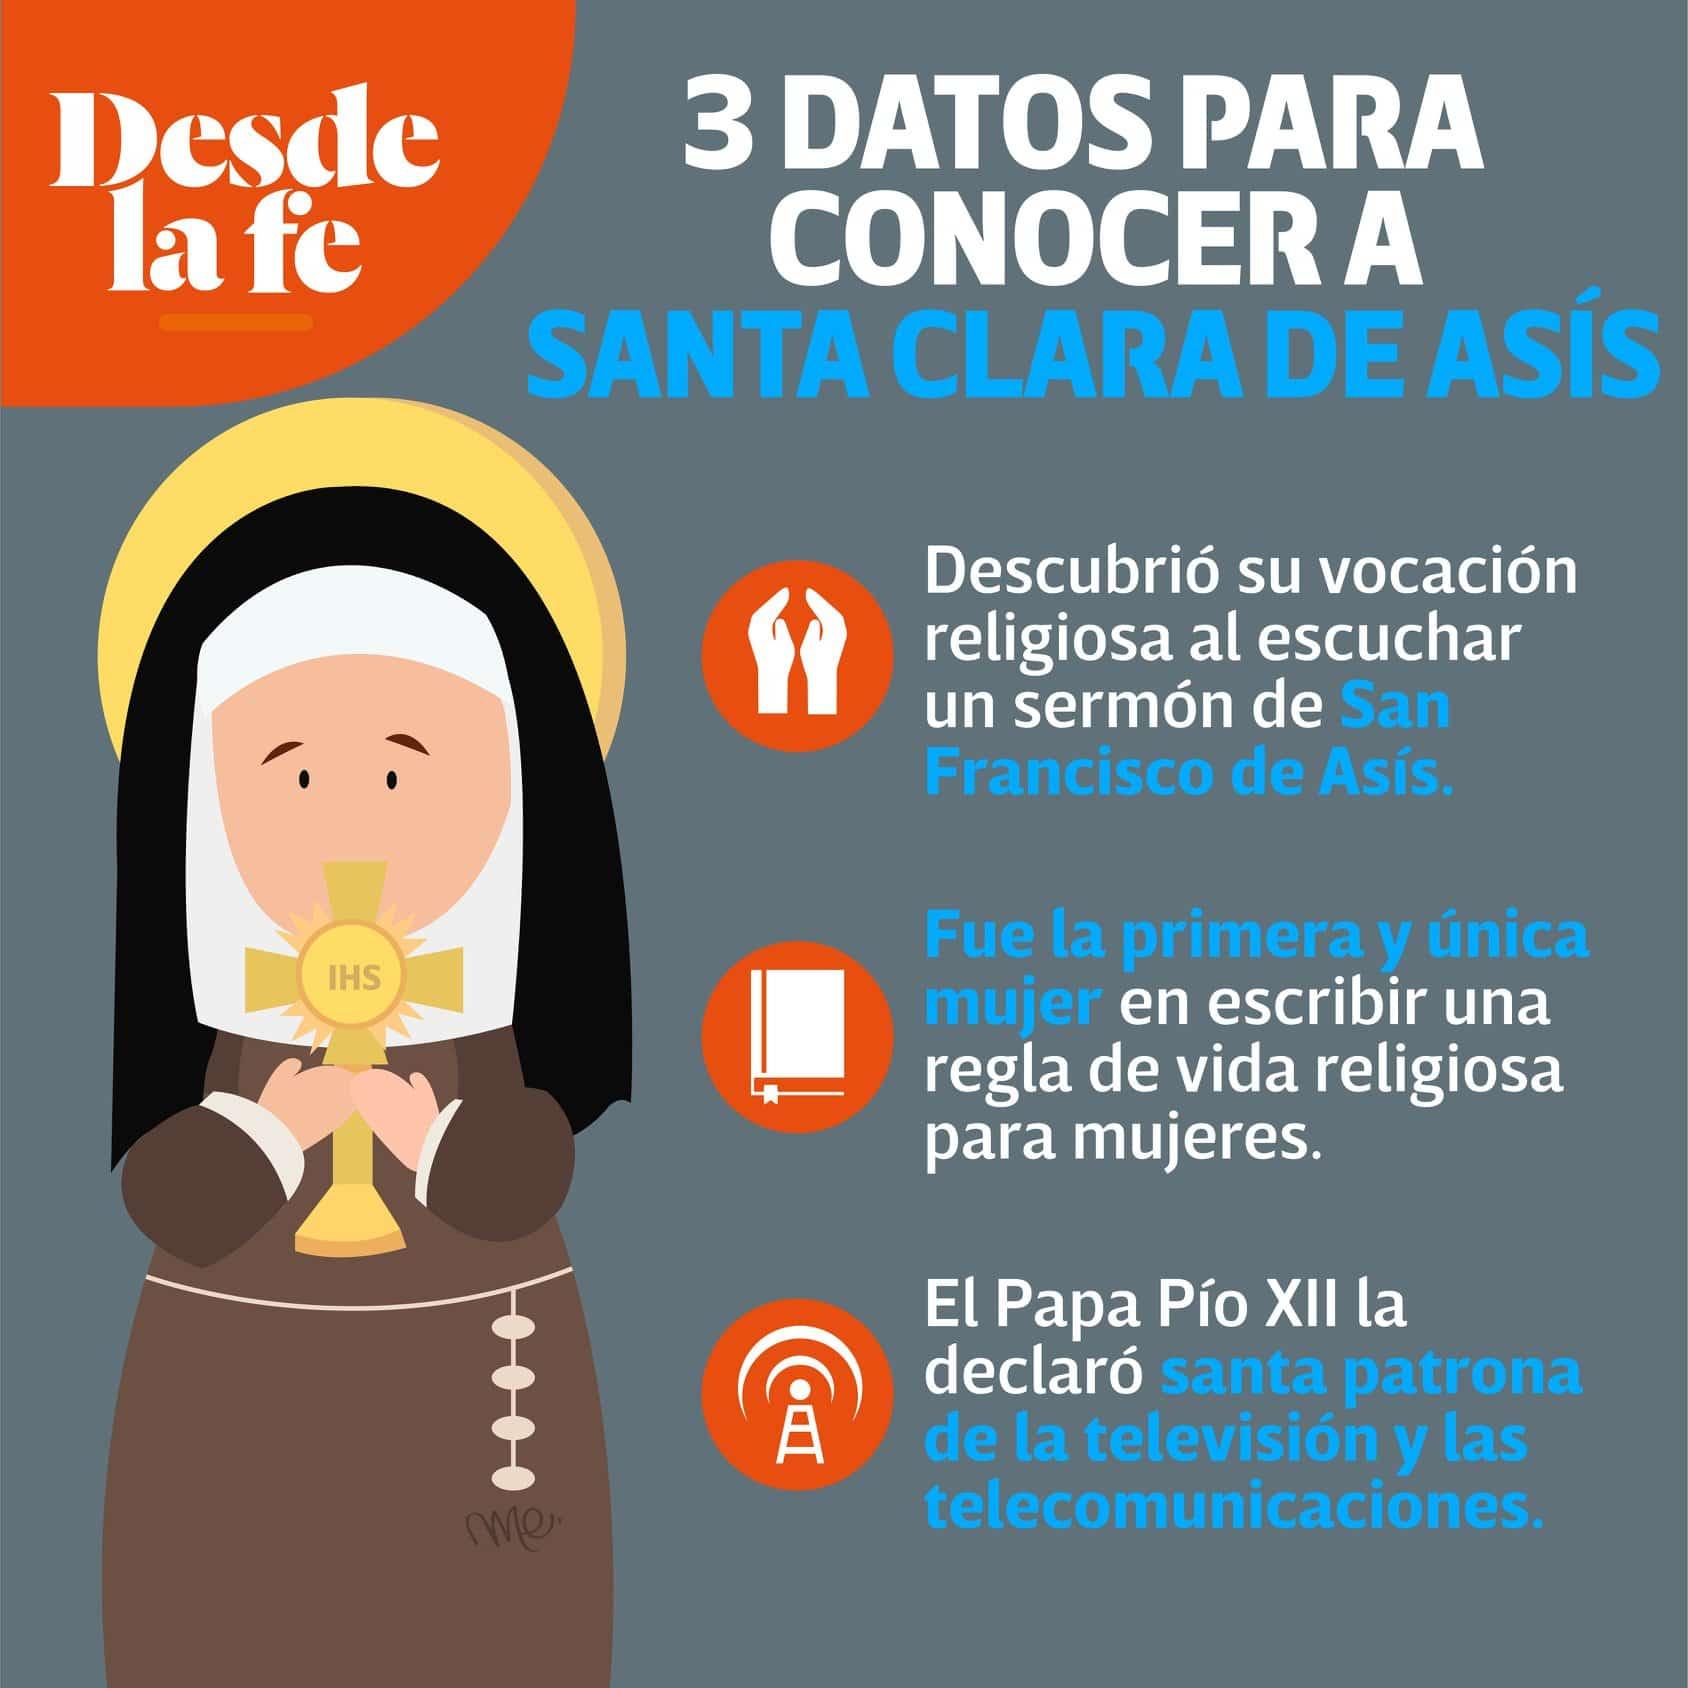 Datos para conocer a Santa Clara de Asís.